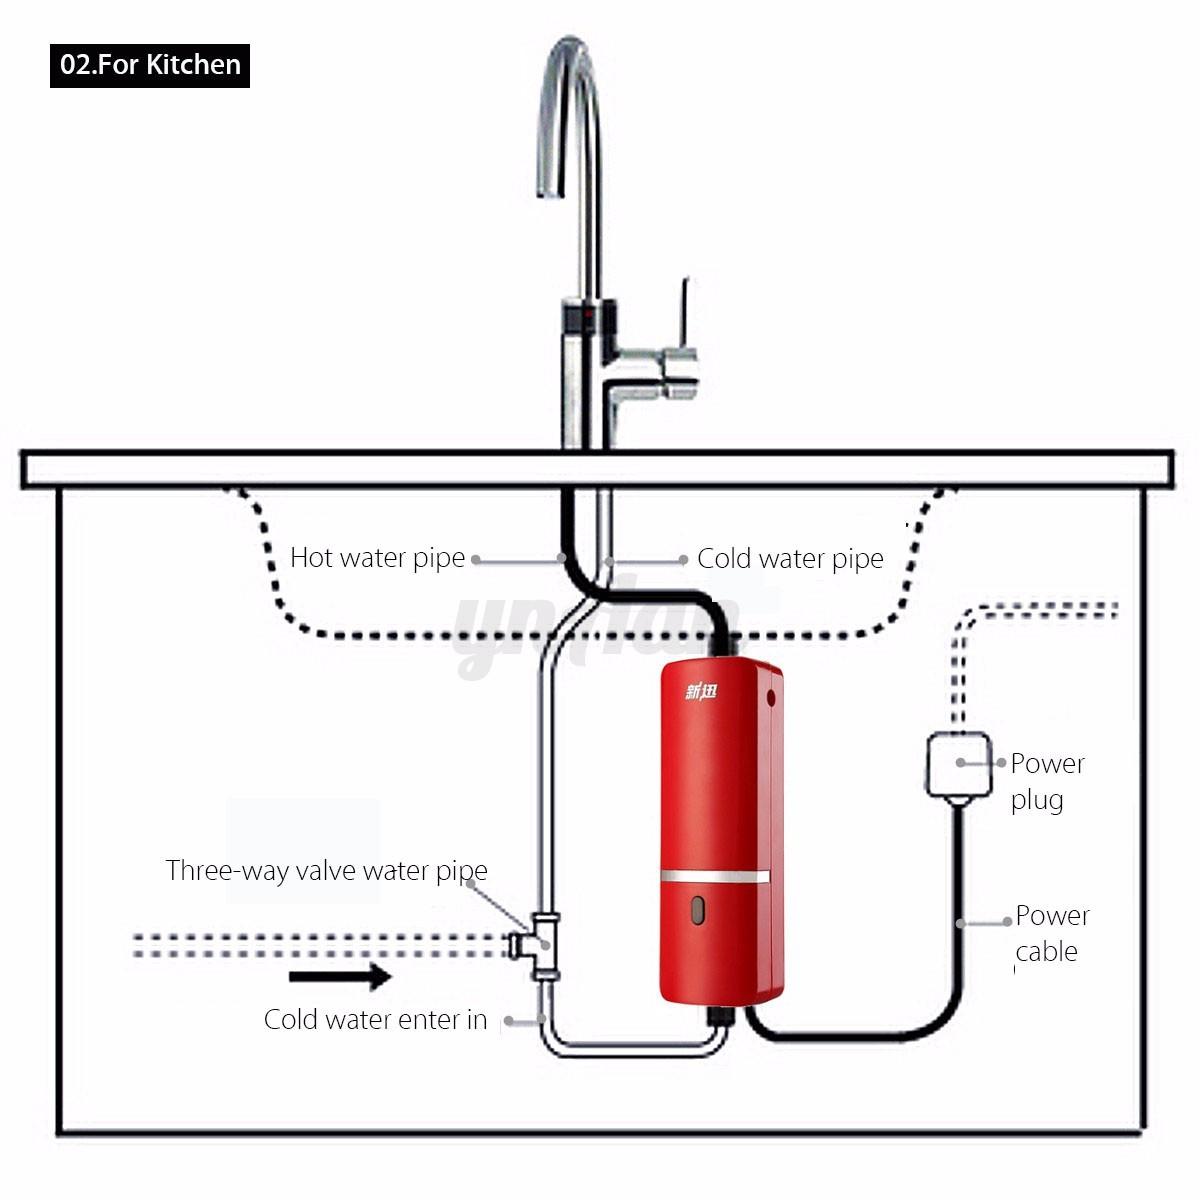 Kitchen Instant Hot Water System : Bathroom kitchen electric instant hot water system